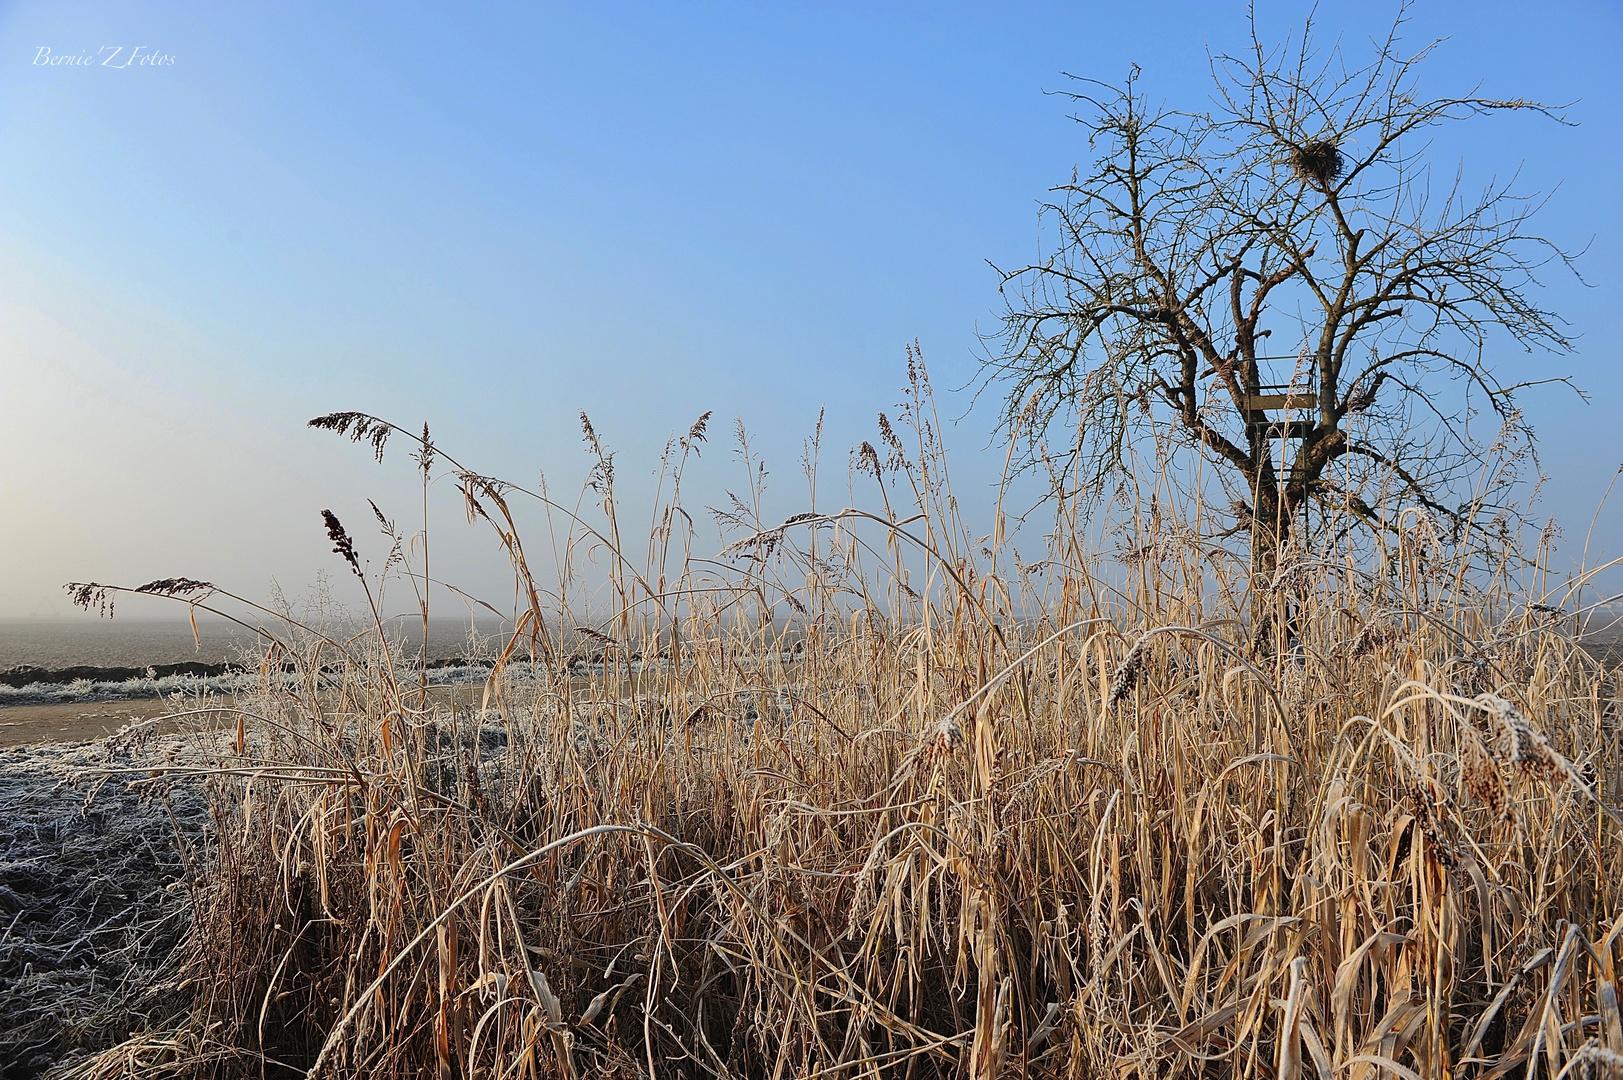 hiver en rase campagne